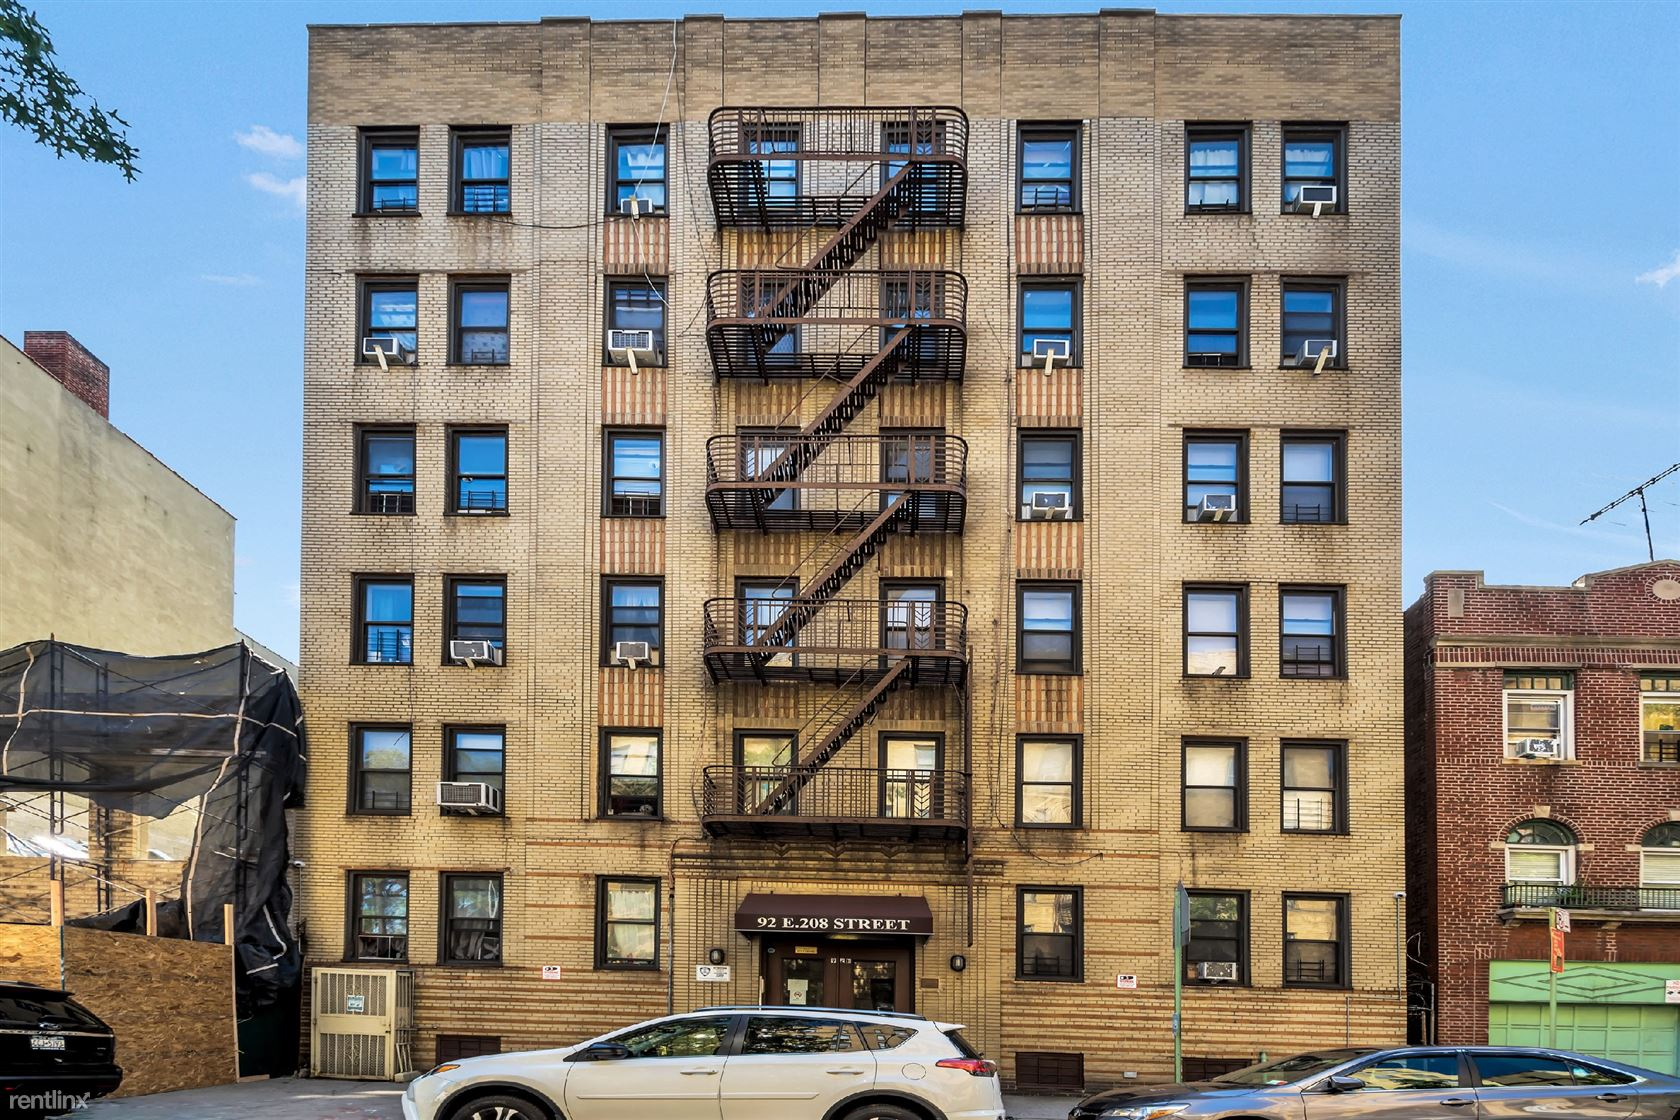 92 East 208th Street